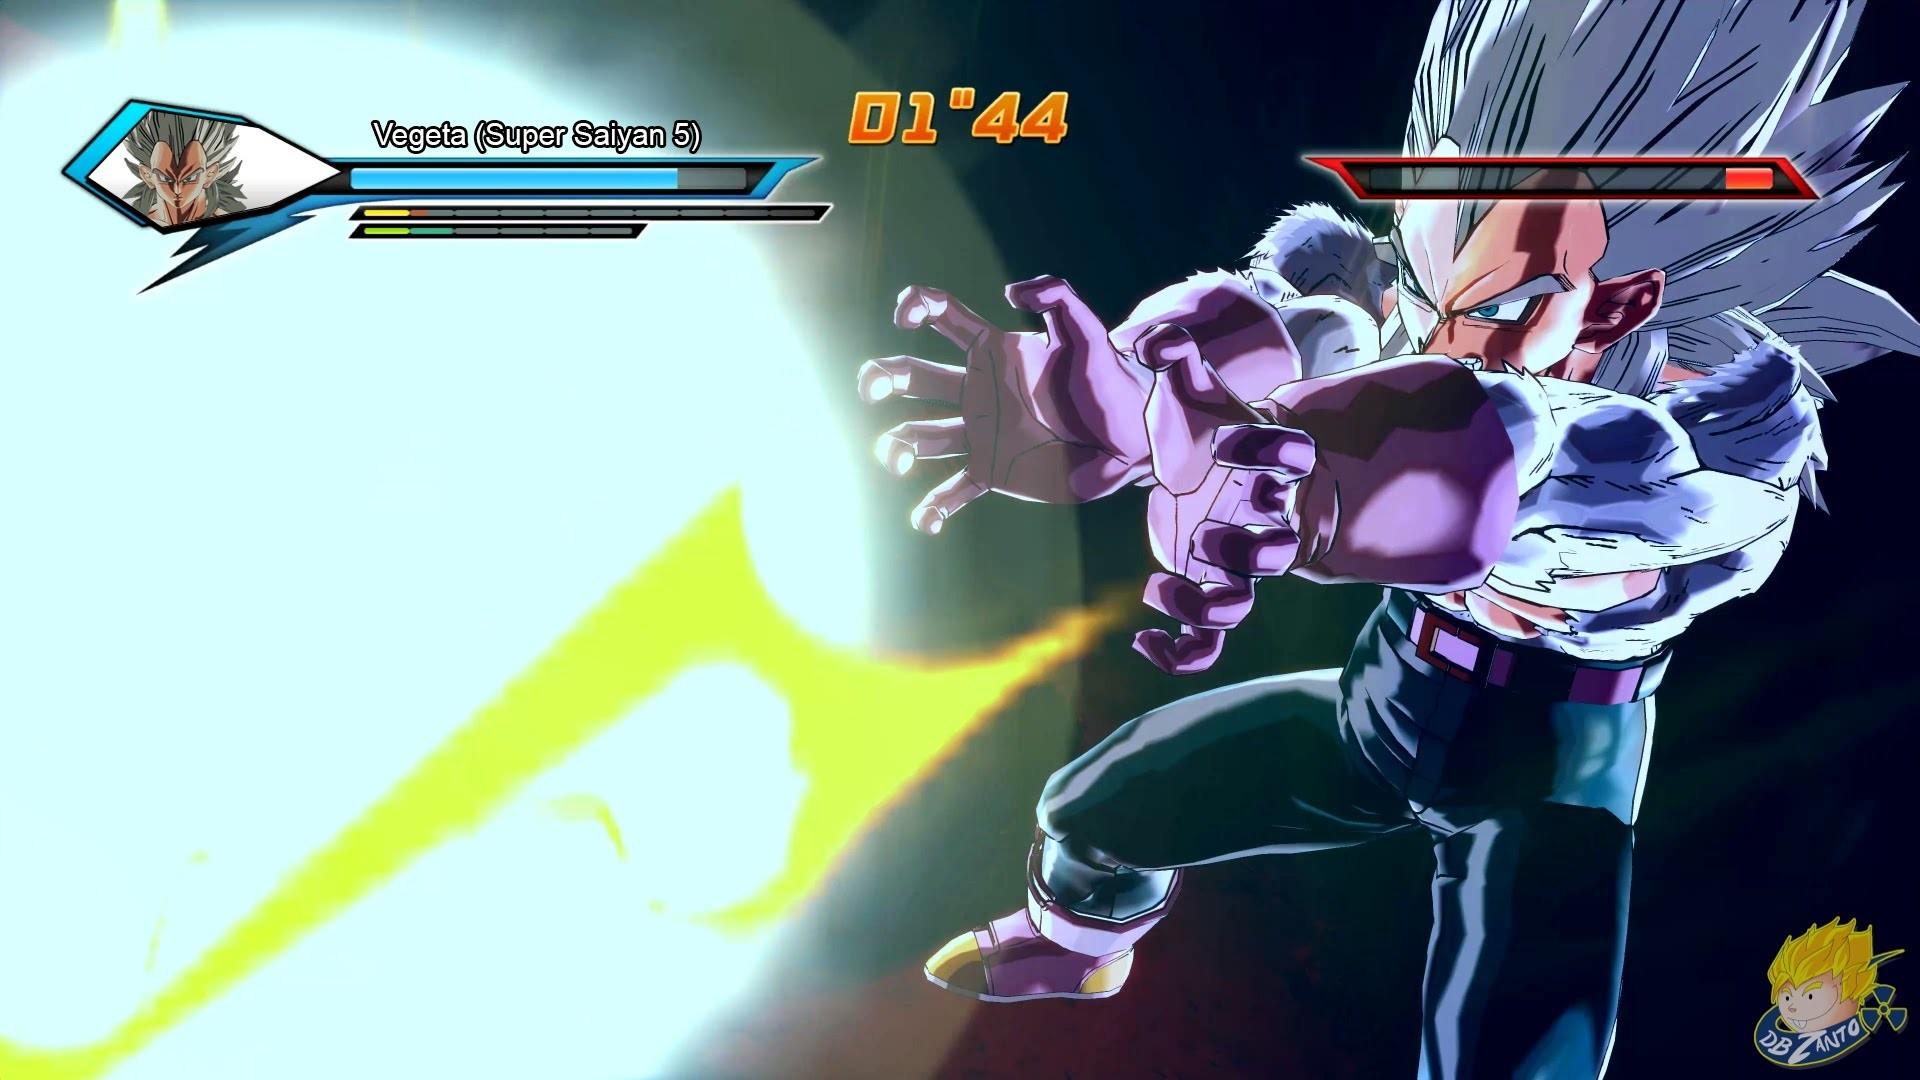 Dragon Ball Xenoverse (PC): Super Saiyan 5 Vegeta Gameplay [MOD] 【60FPS  1080P】 – YouTube